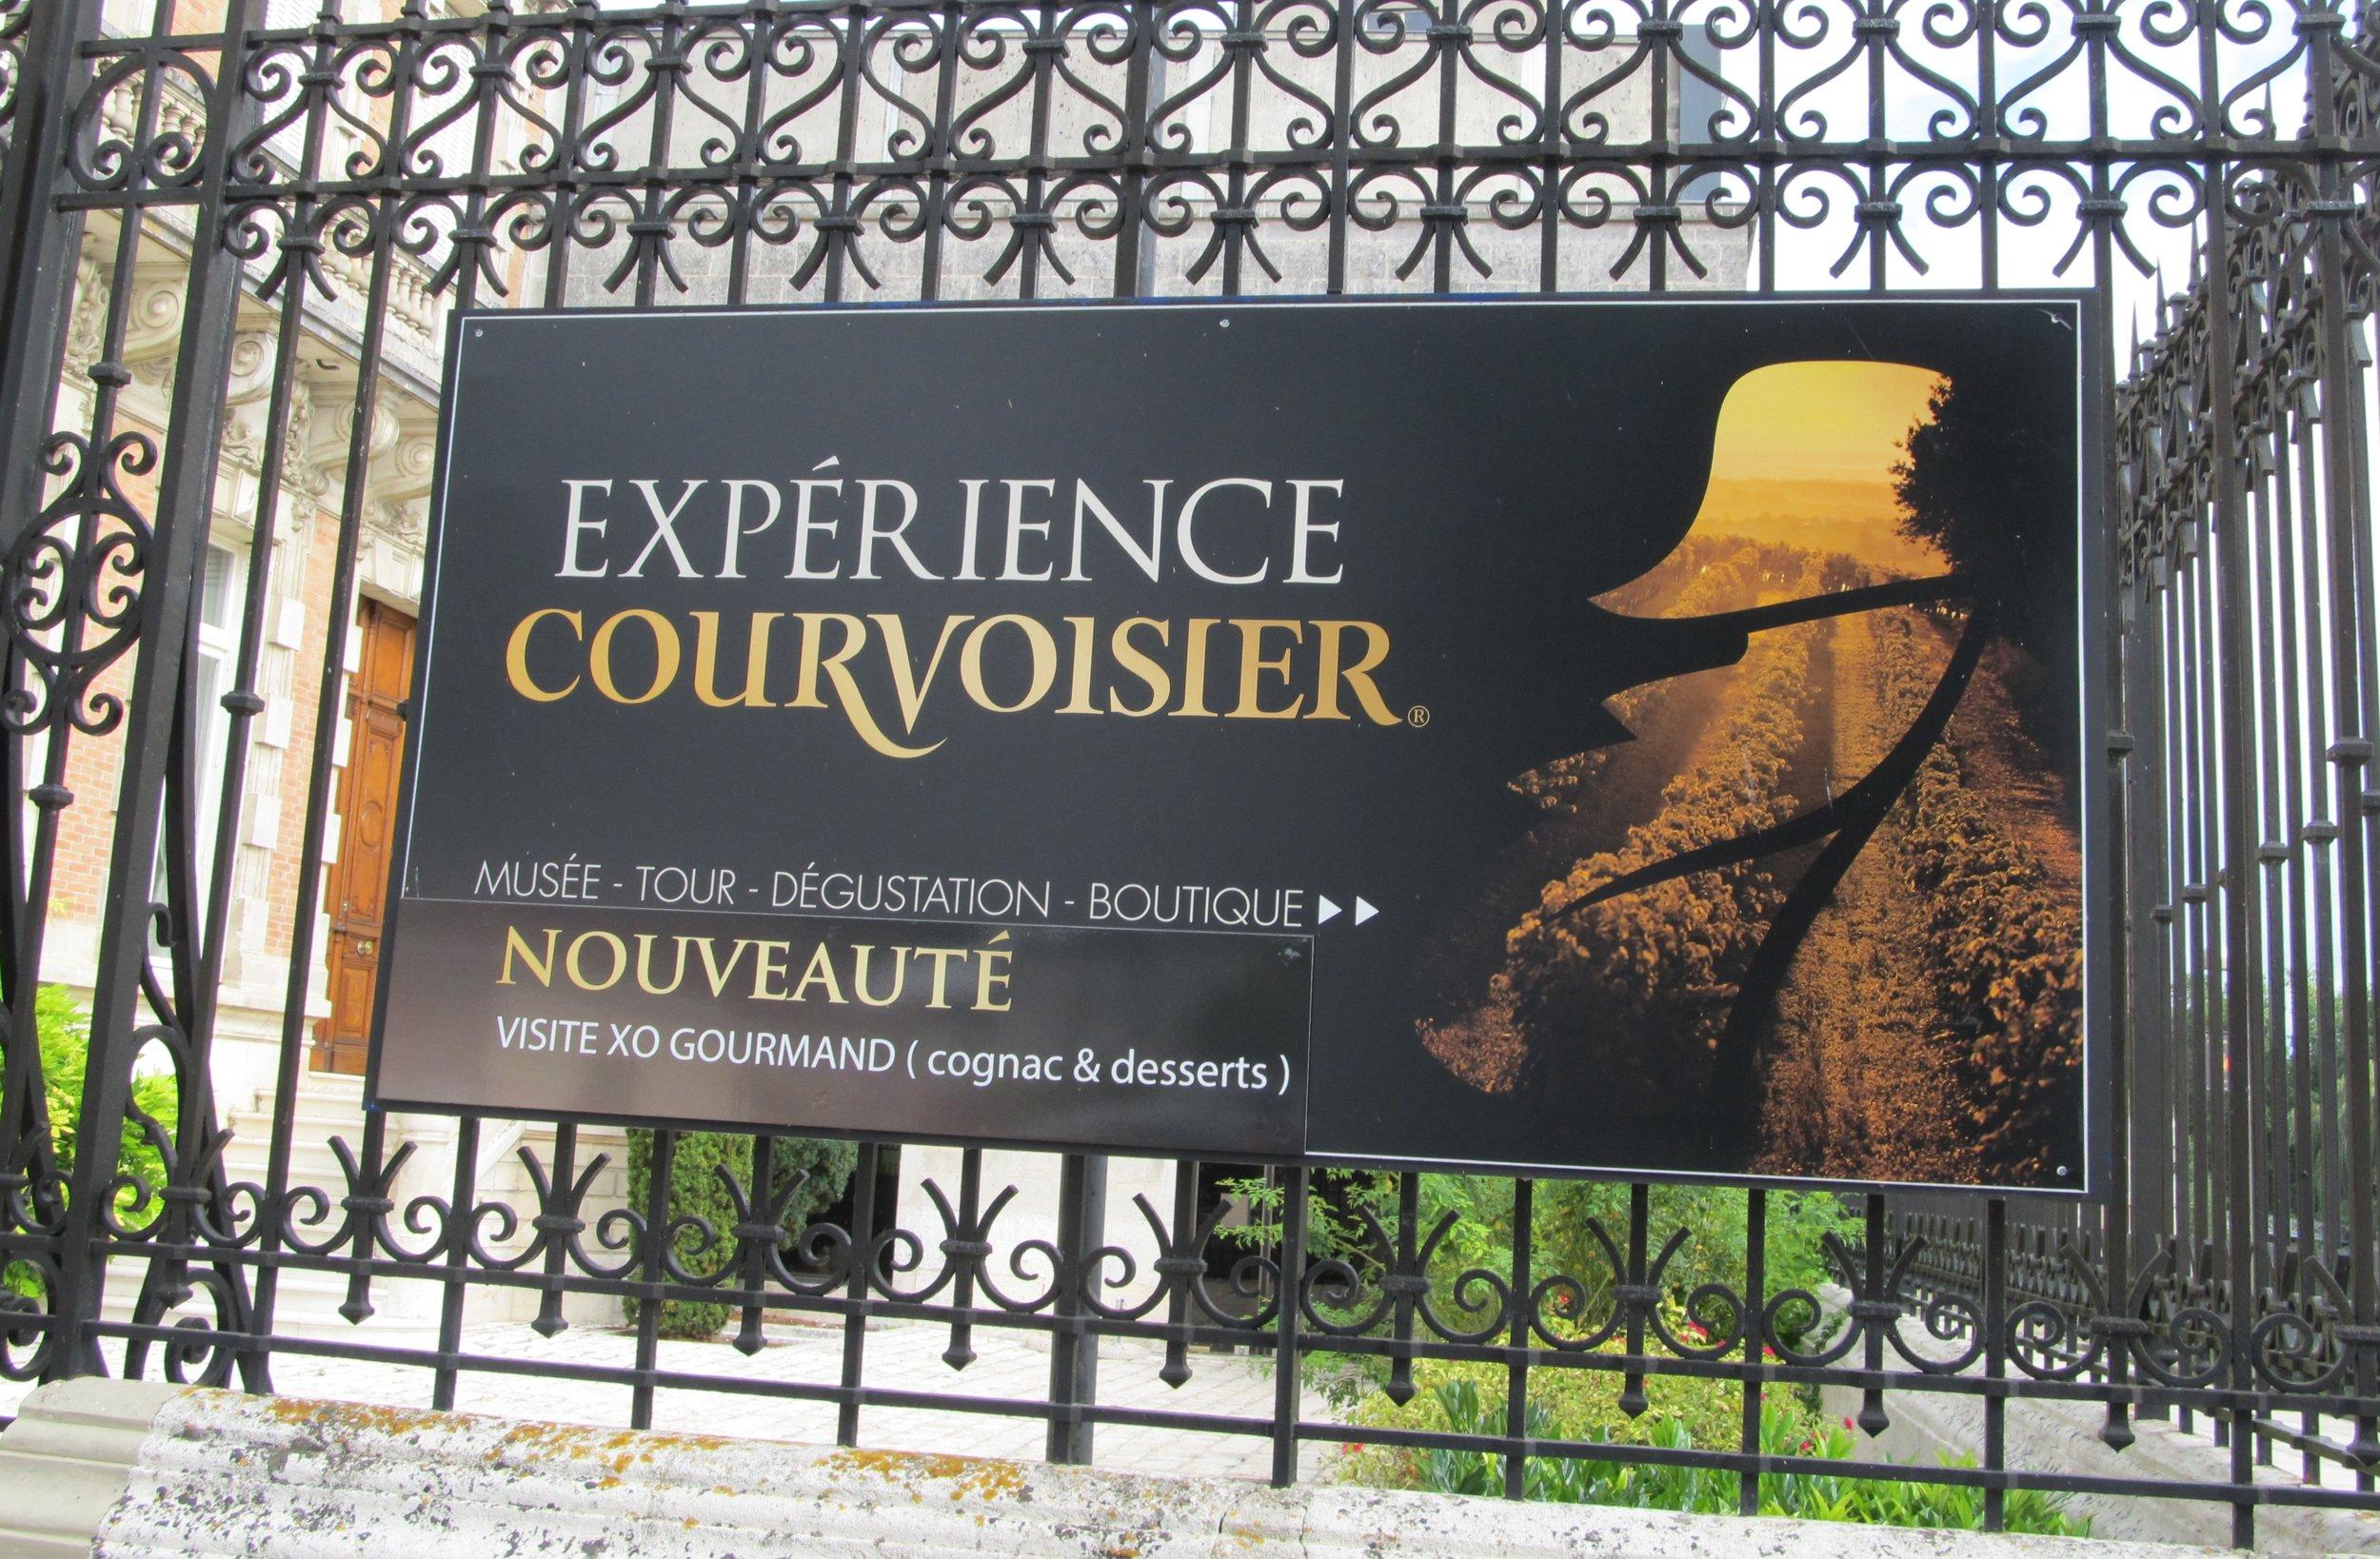 Courvoisier-Distillery-Museum-sign-credit-Mike-Gerrard.jpg